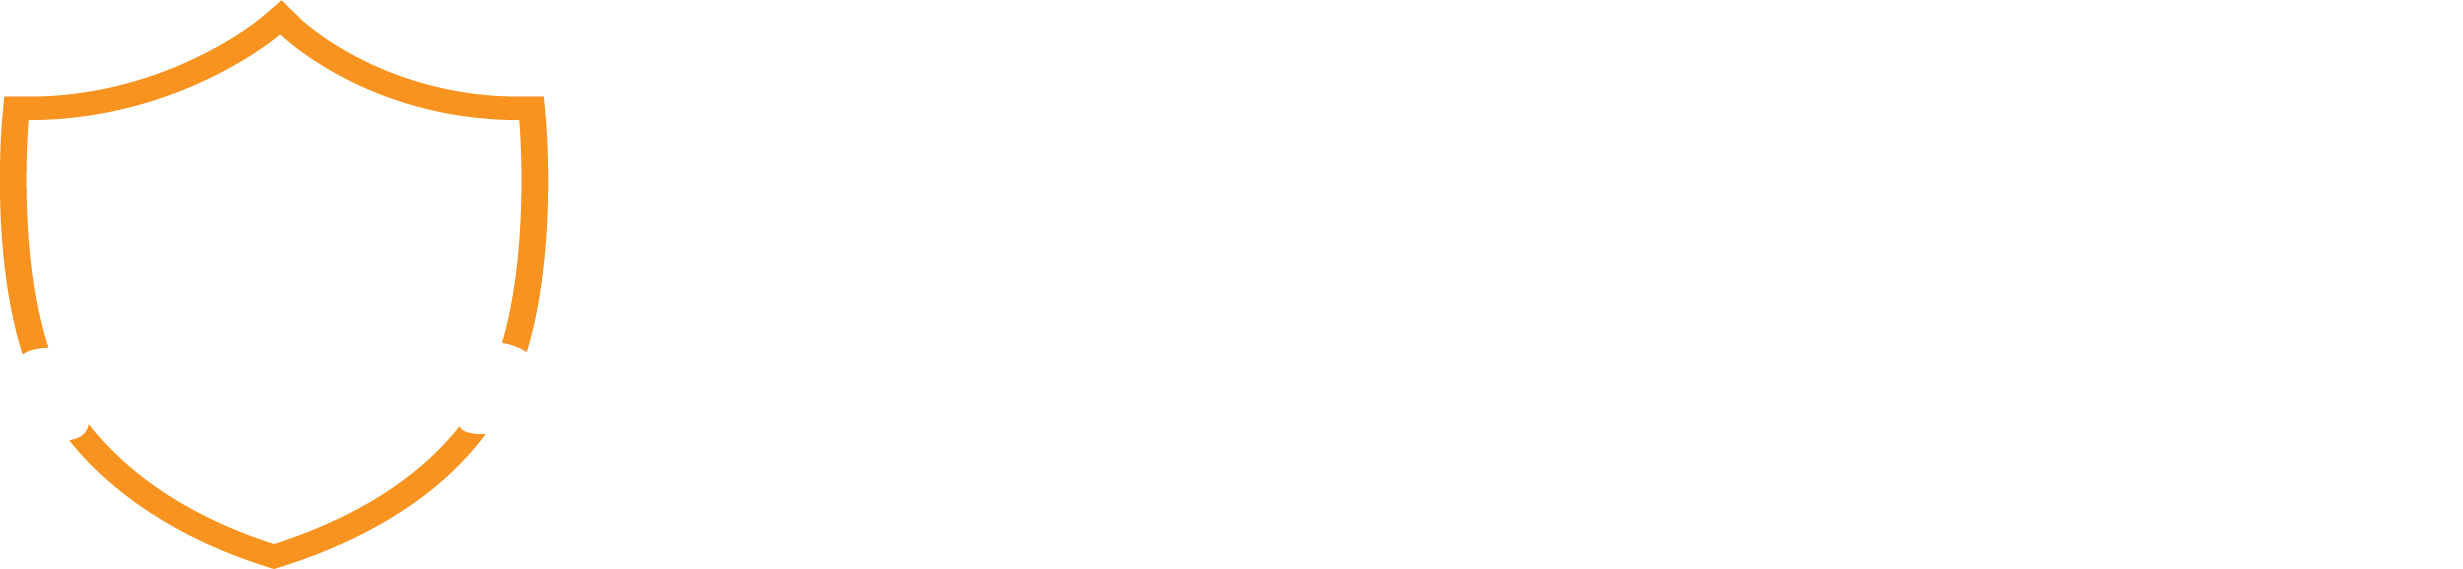 Somalia Online